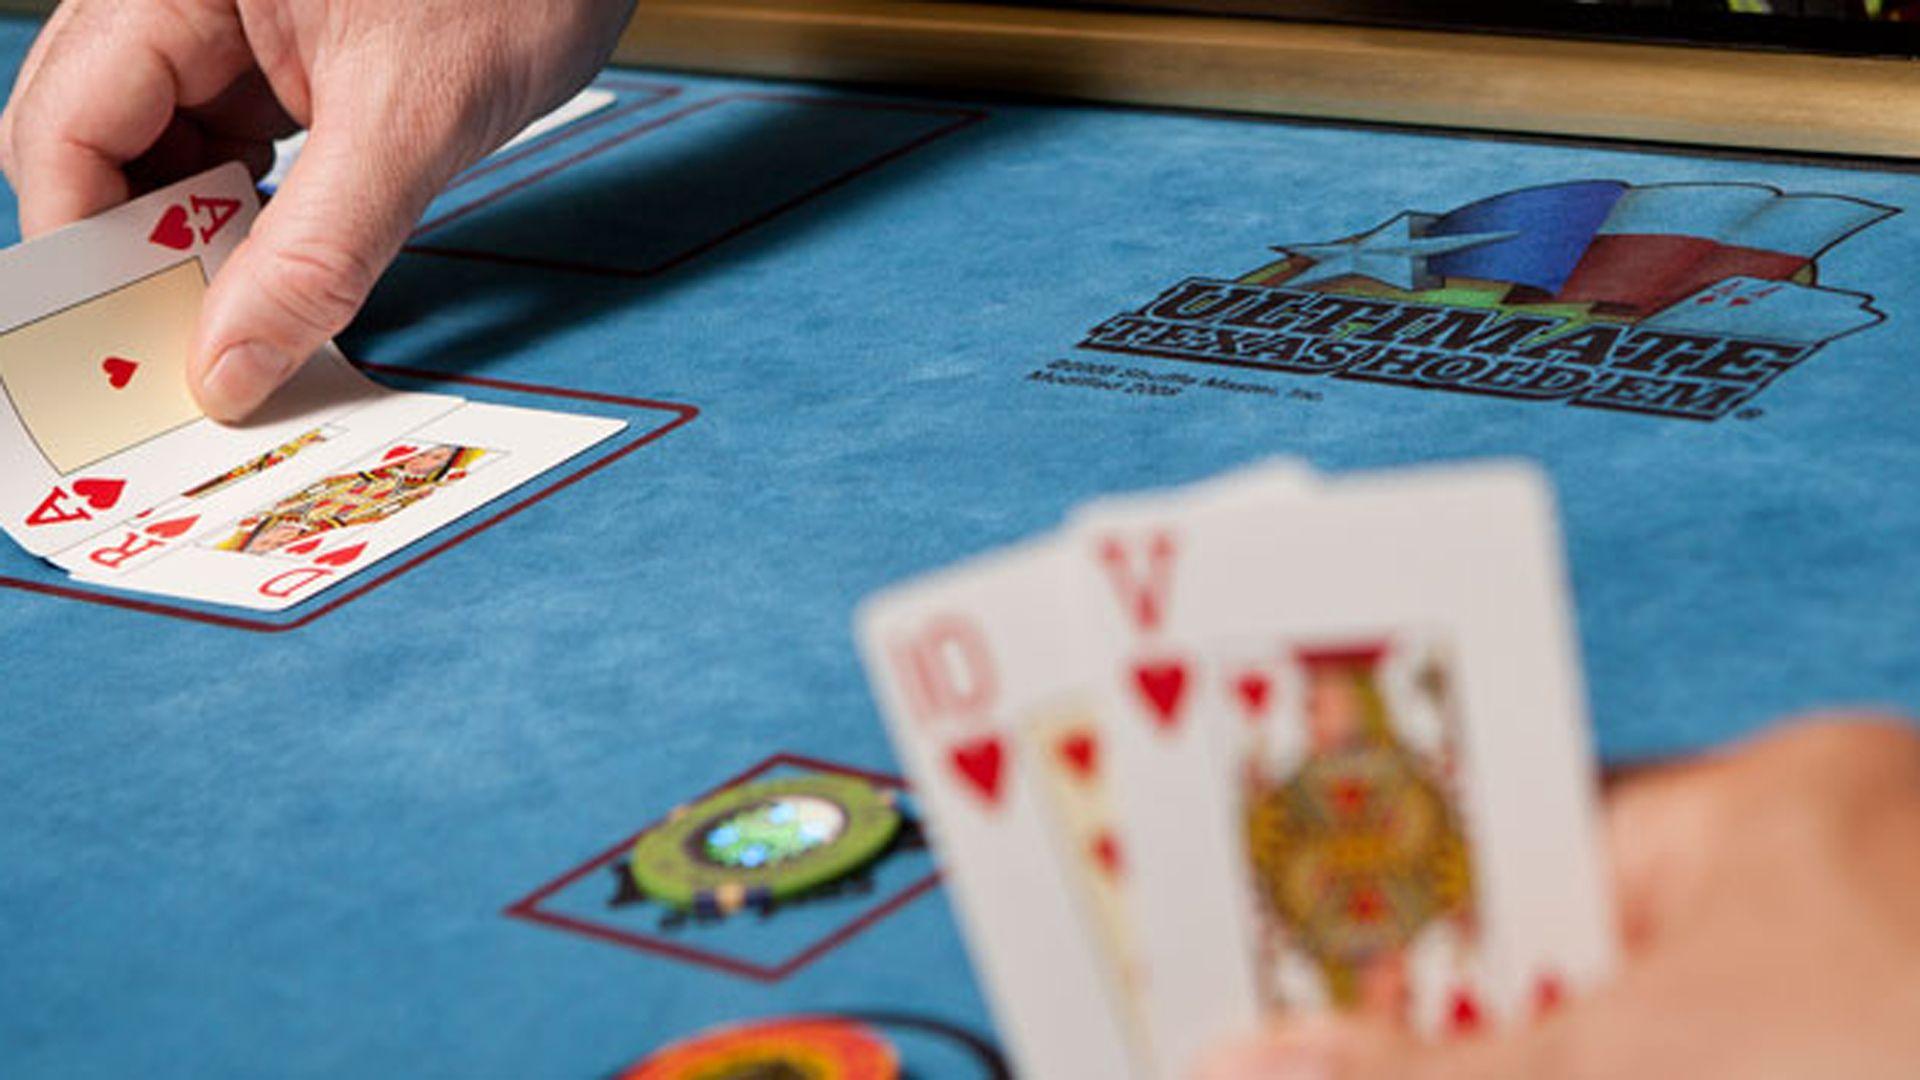 Le 5 strategie essenziali per vincere al Texas Hold'em